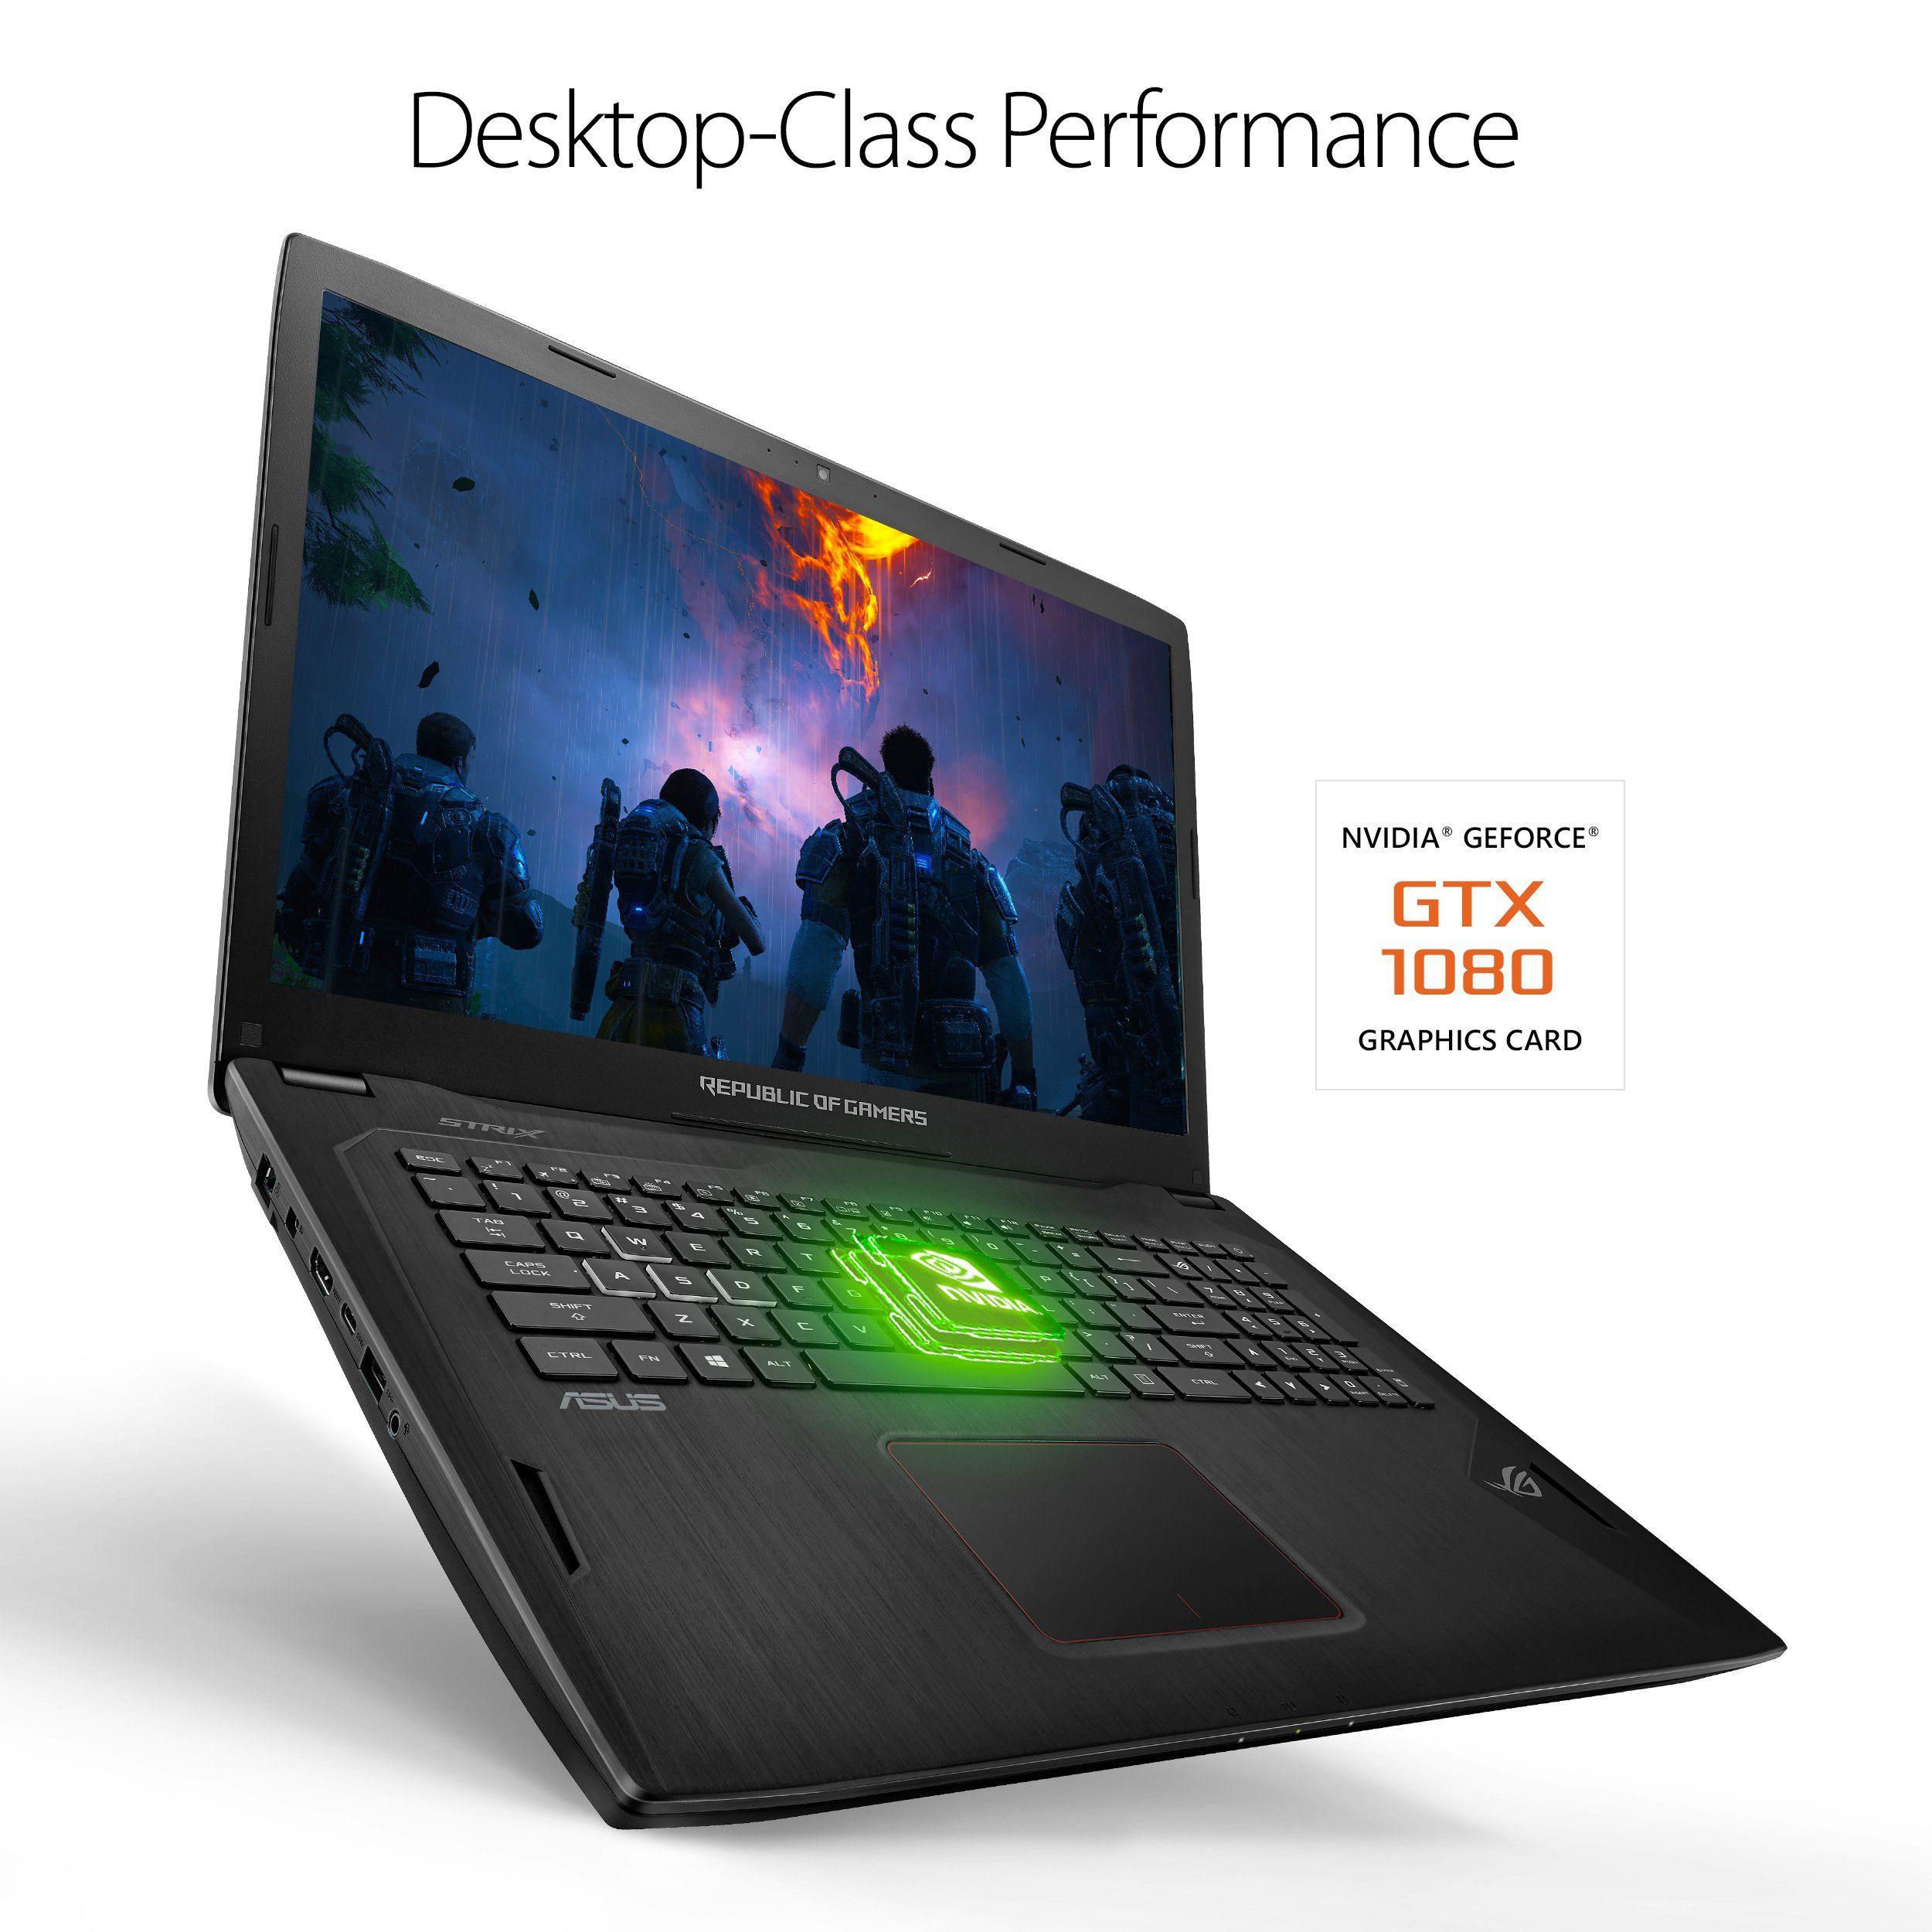 ROG STRIX GL702VI Gaming Laptop 17¢€ Full HD Panel Intel Core i7 2 8GHz Processor